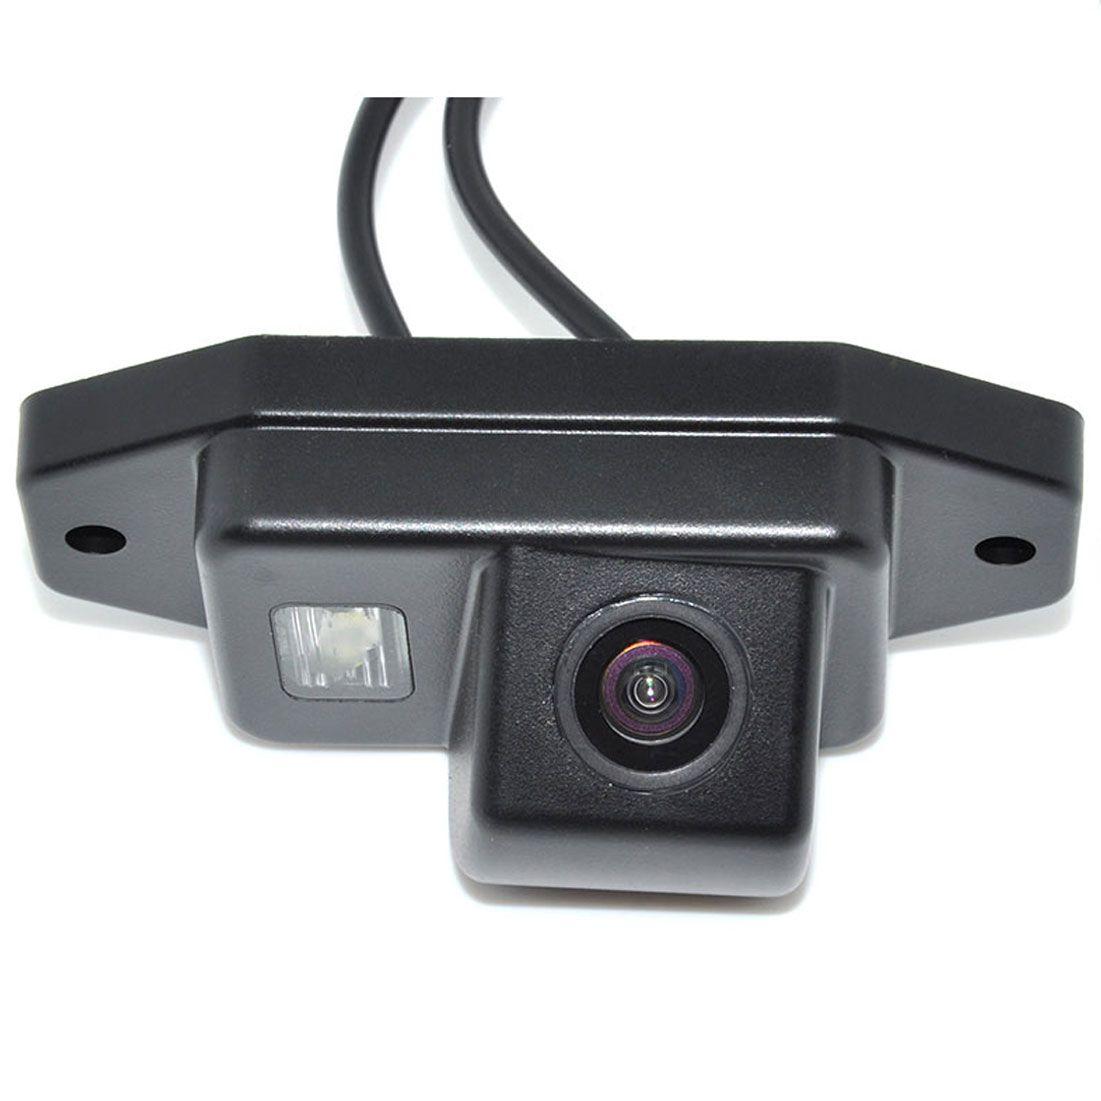 HD CCD Car rear <font><b>view</b></font> camera backup camera for 2002-2009 Toyota Land Cruiser 120 Series Toyota Prado 2700 4000